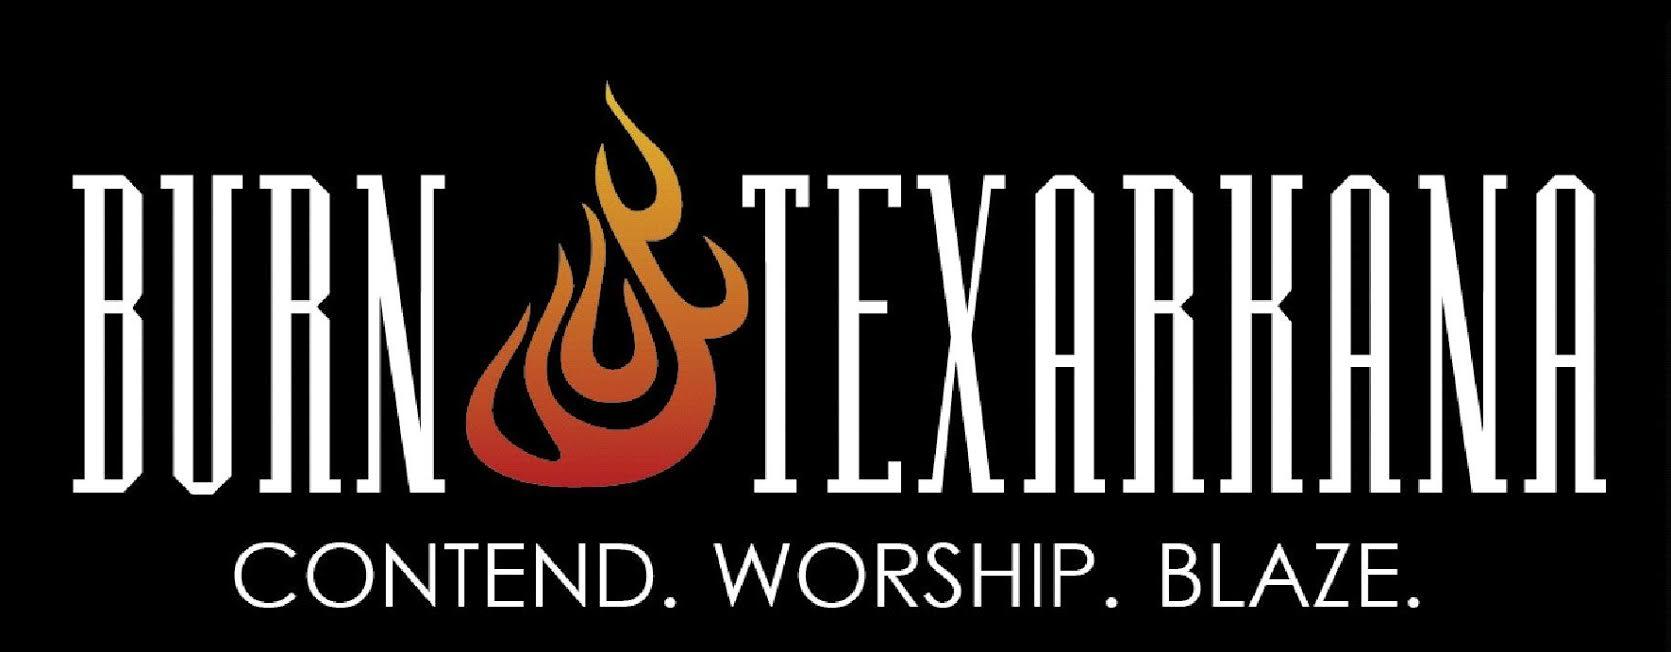 Burn Texarkana